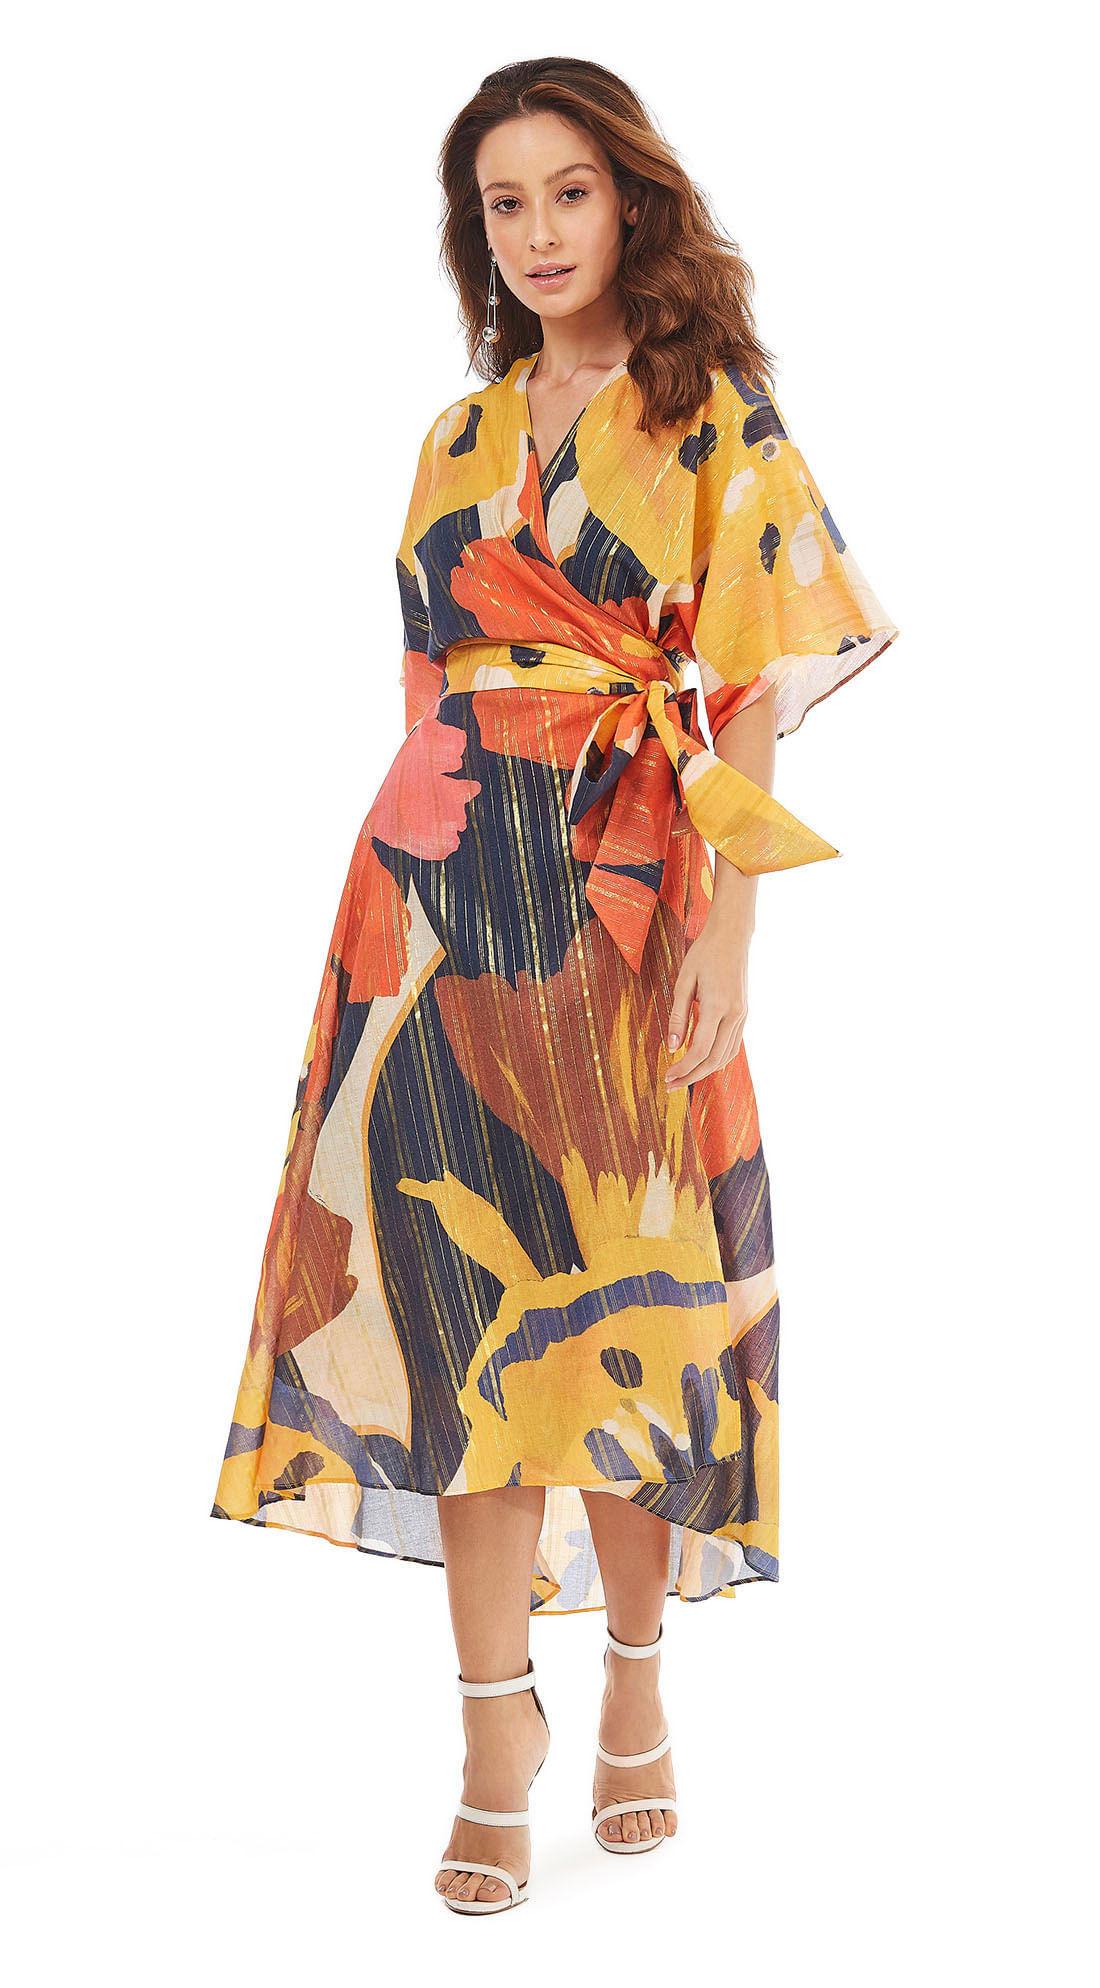 d5aba0303 morenarosa · Vestuário · Vestidos · Vestido Midi Decote Transpassado Com  Amarracao Azul